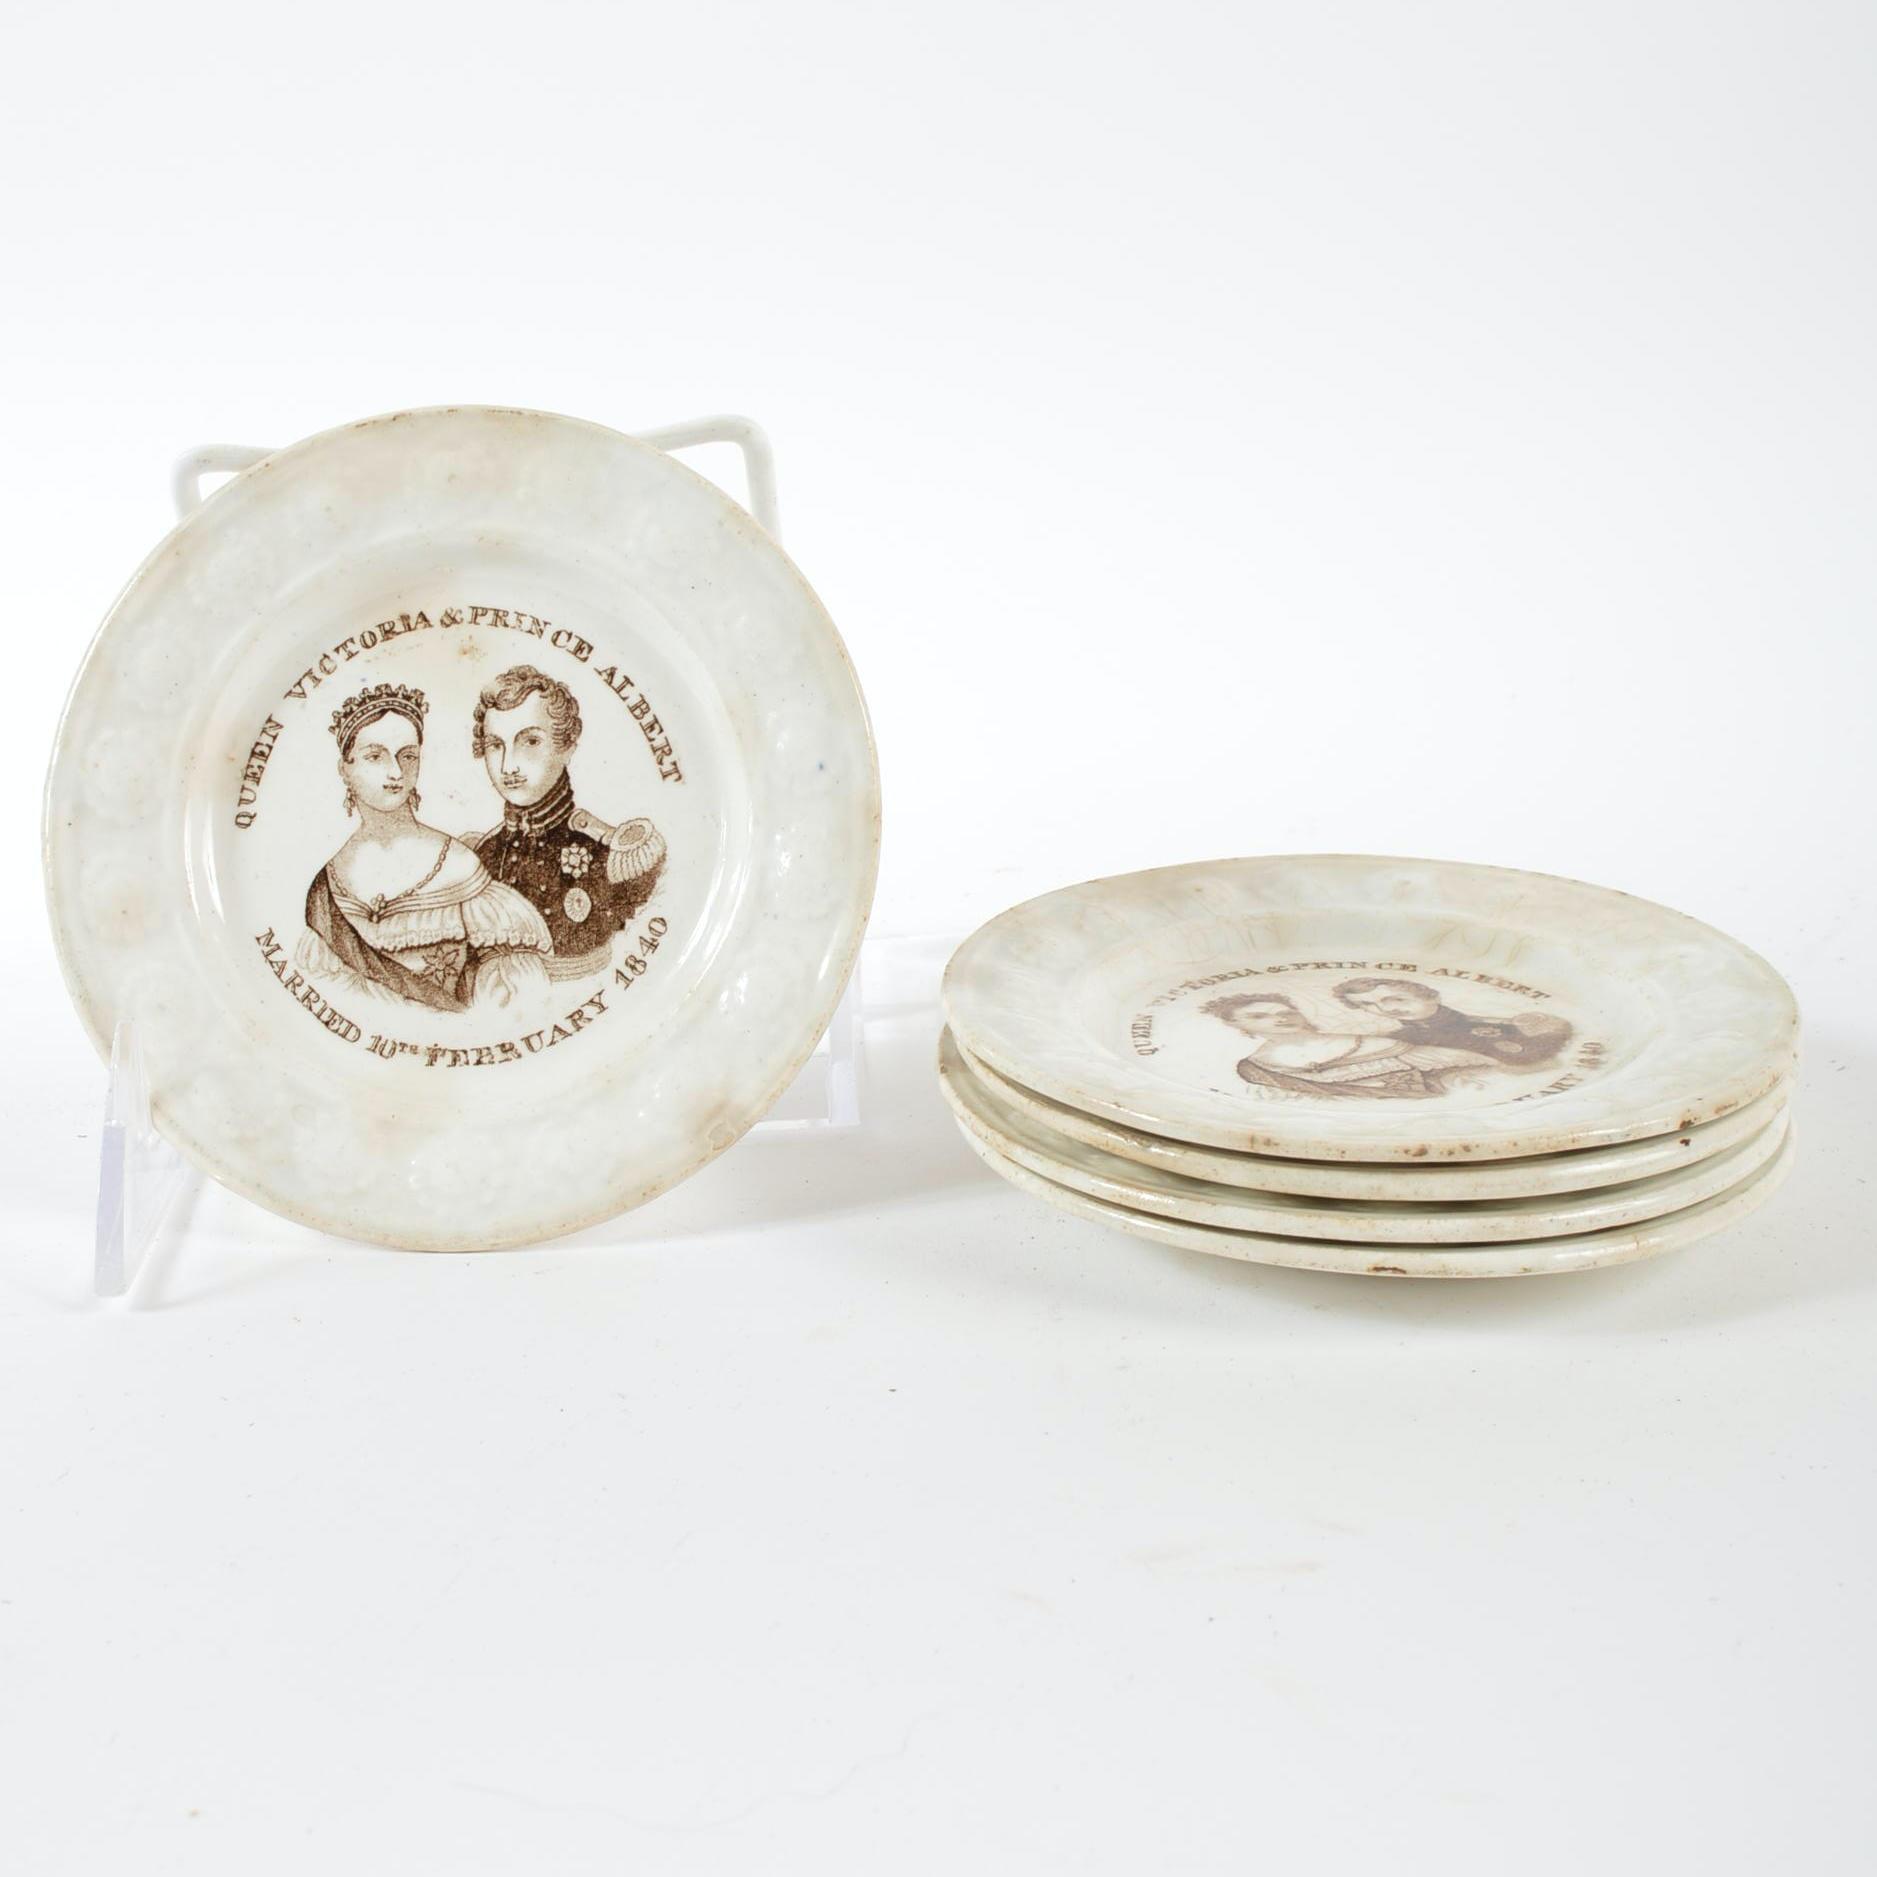 Antique Queen Victoria and Prince Albert Commemorative Plates